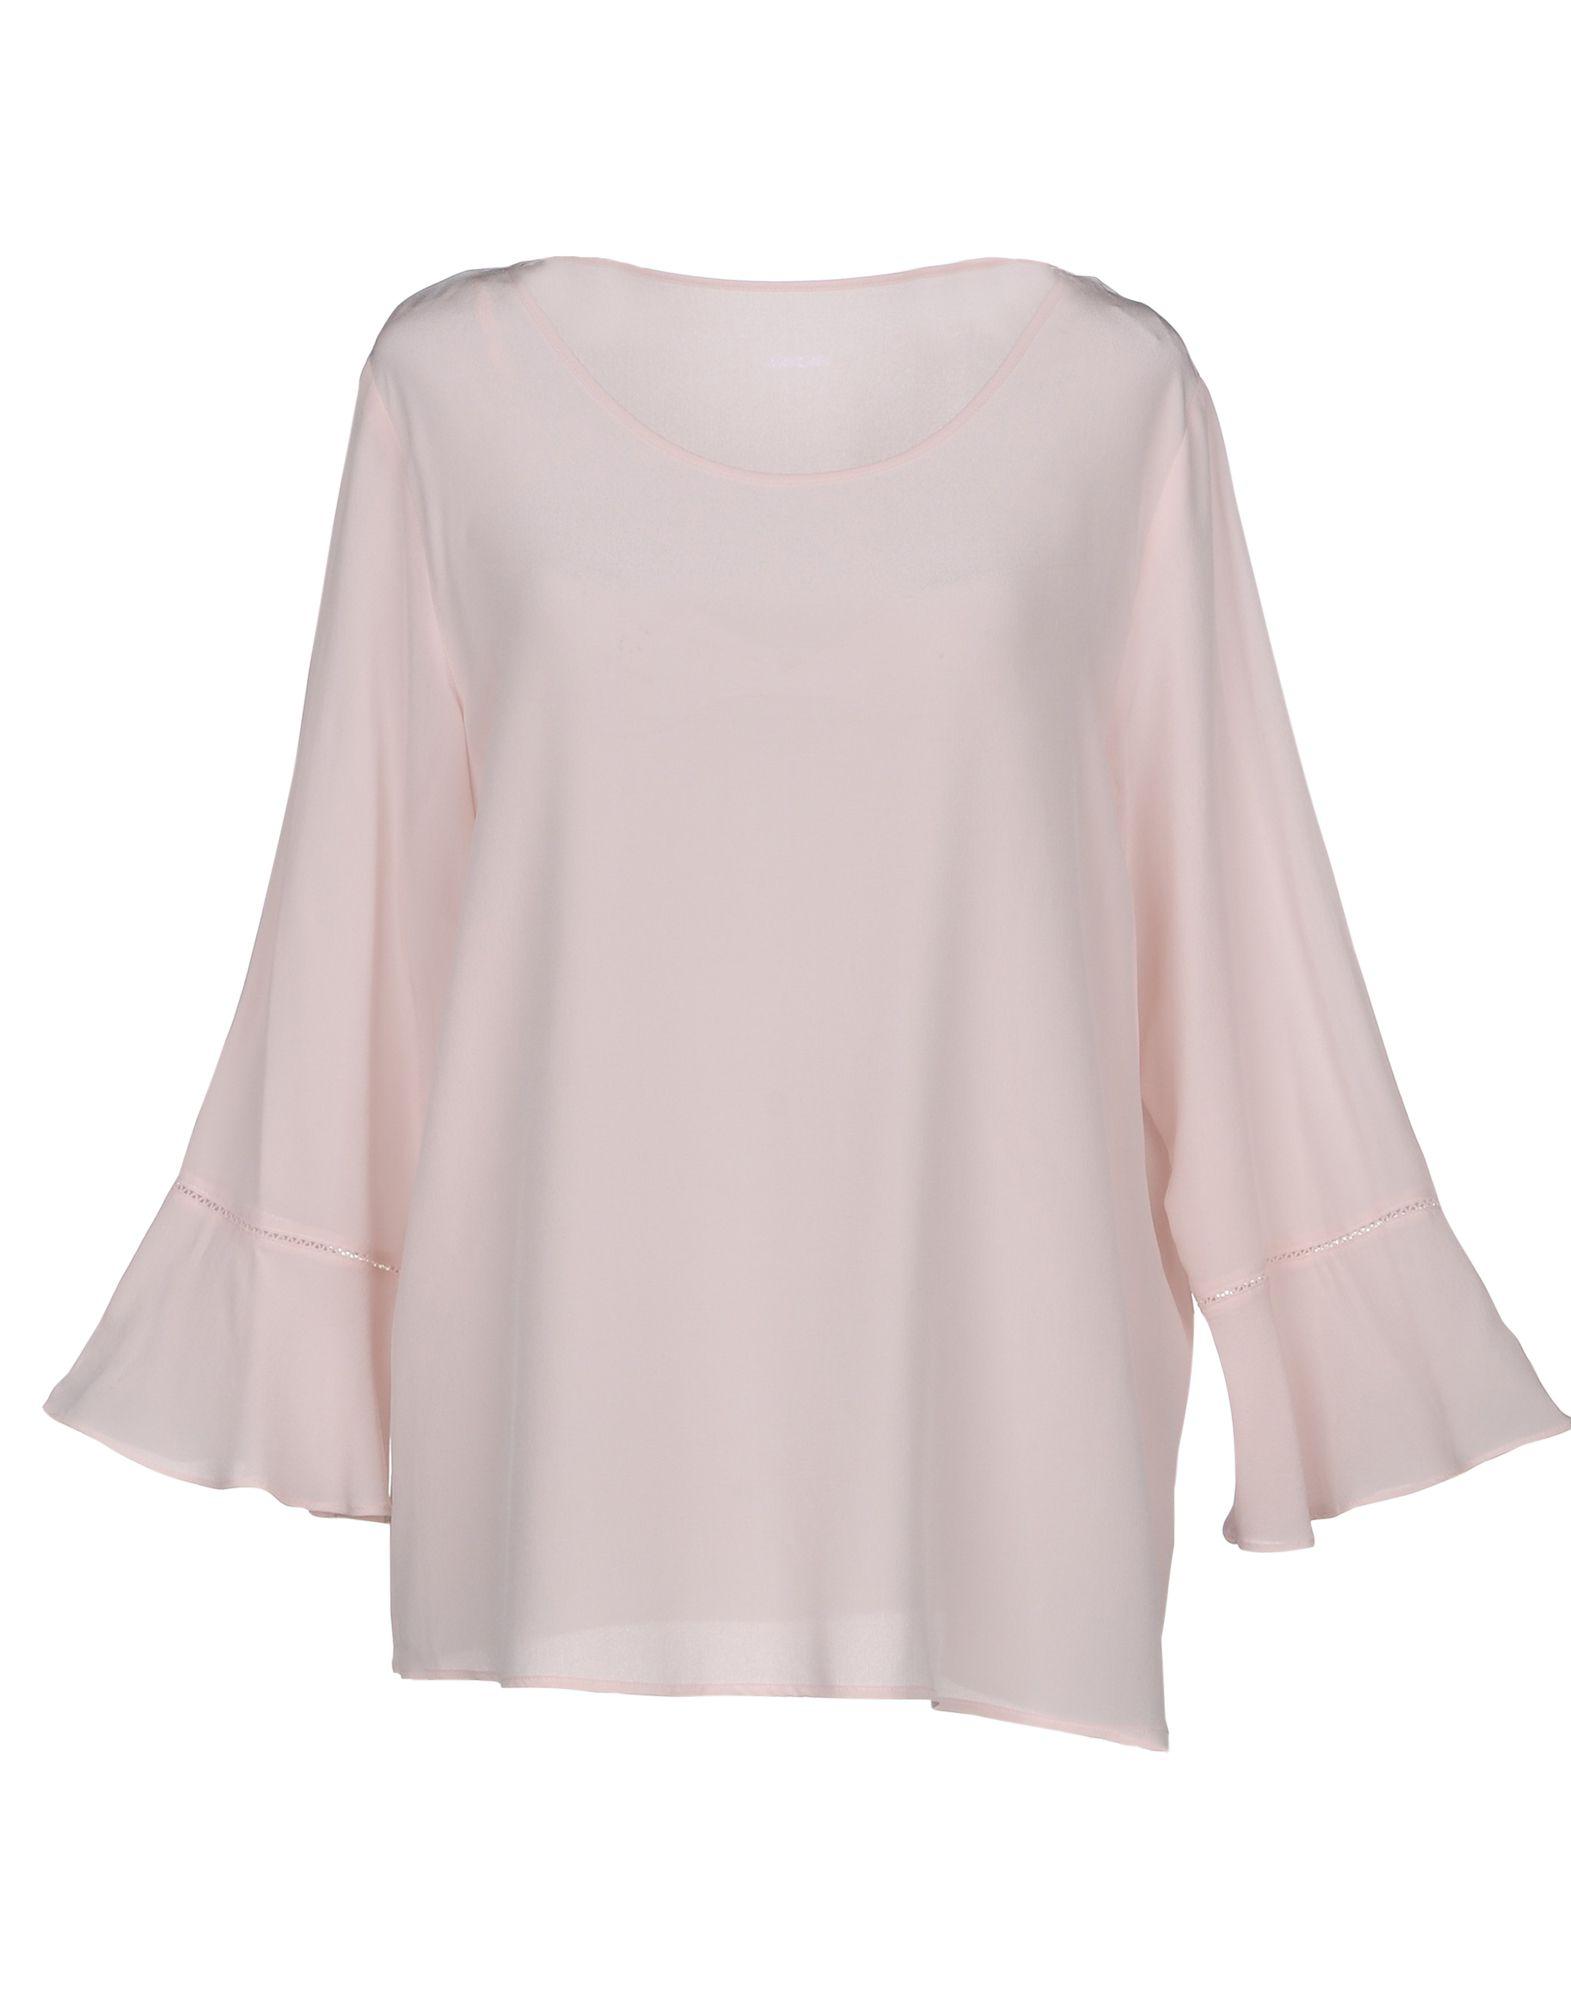 MARC CAIN Блузка marc cain блузка